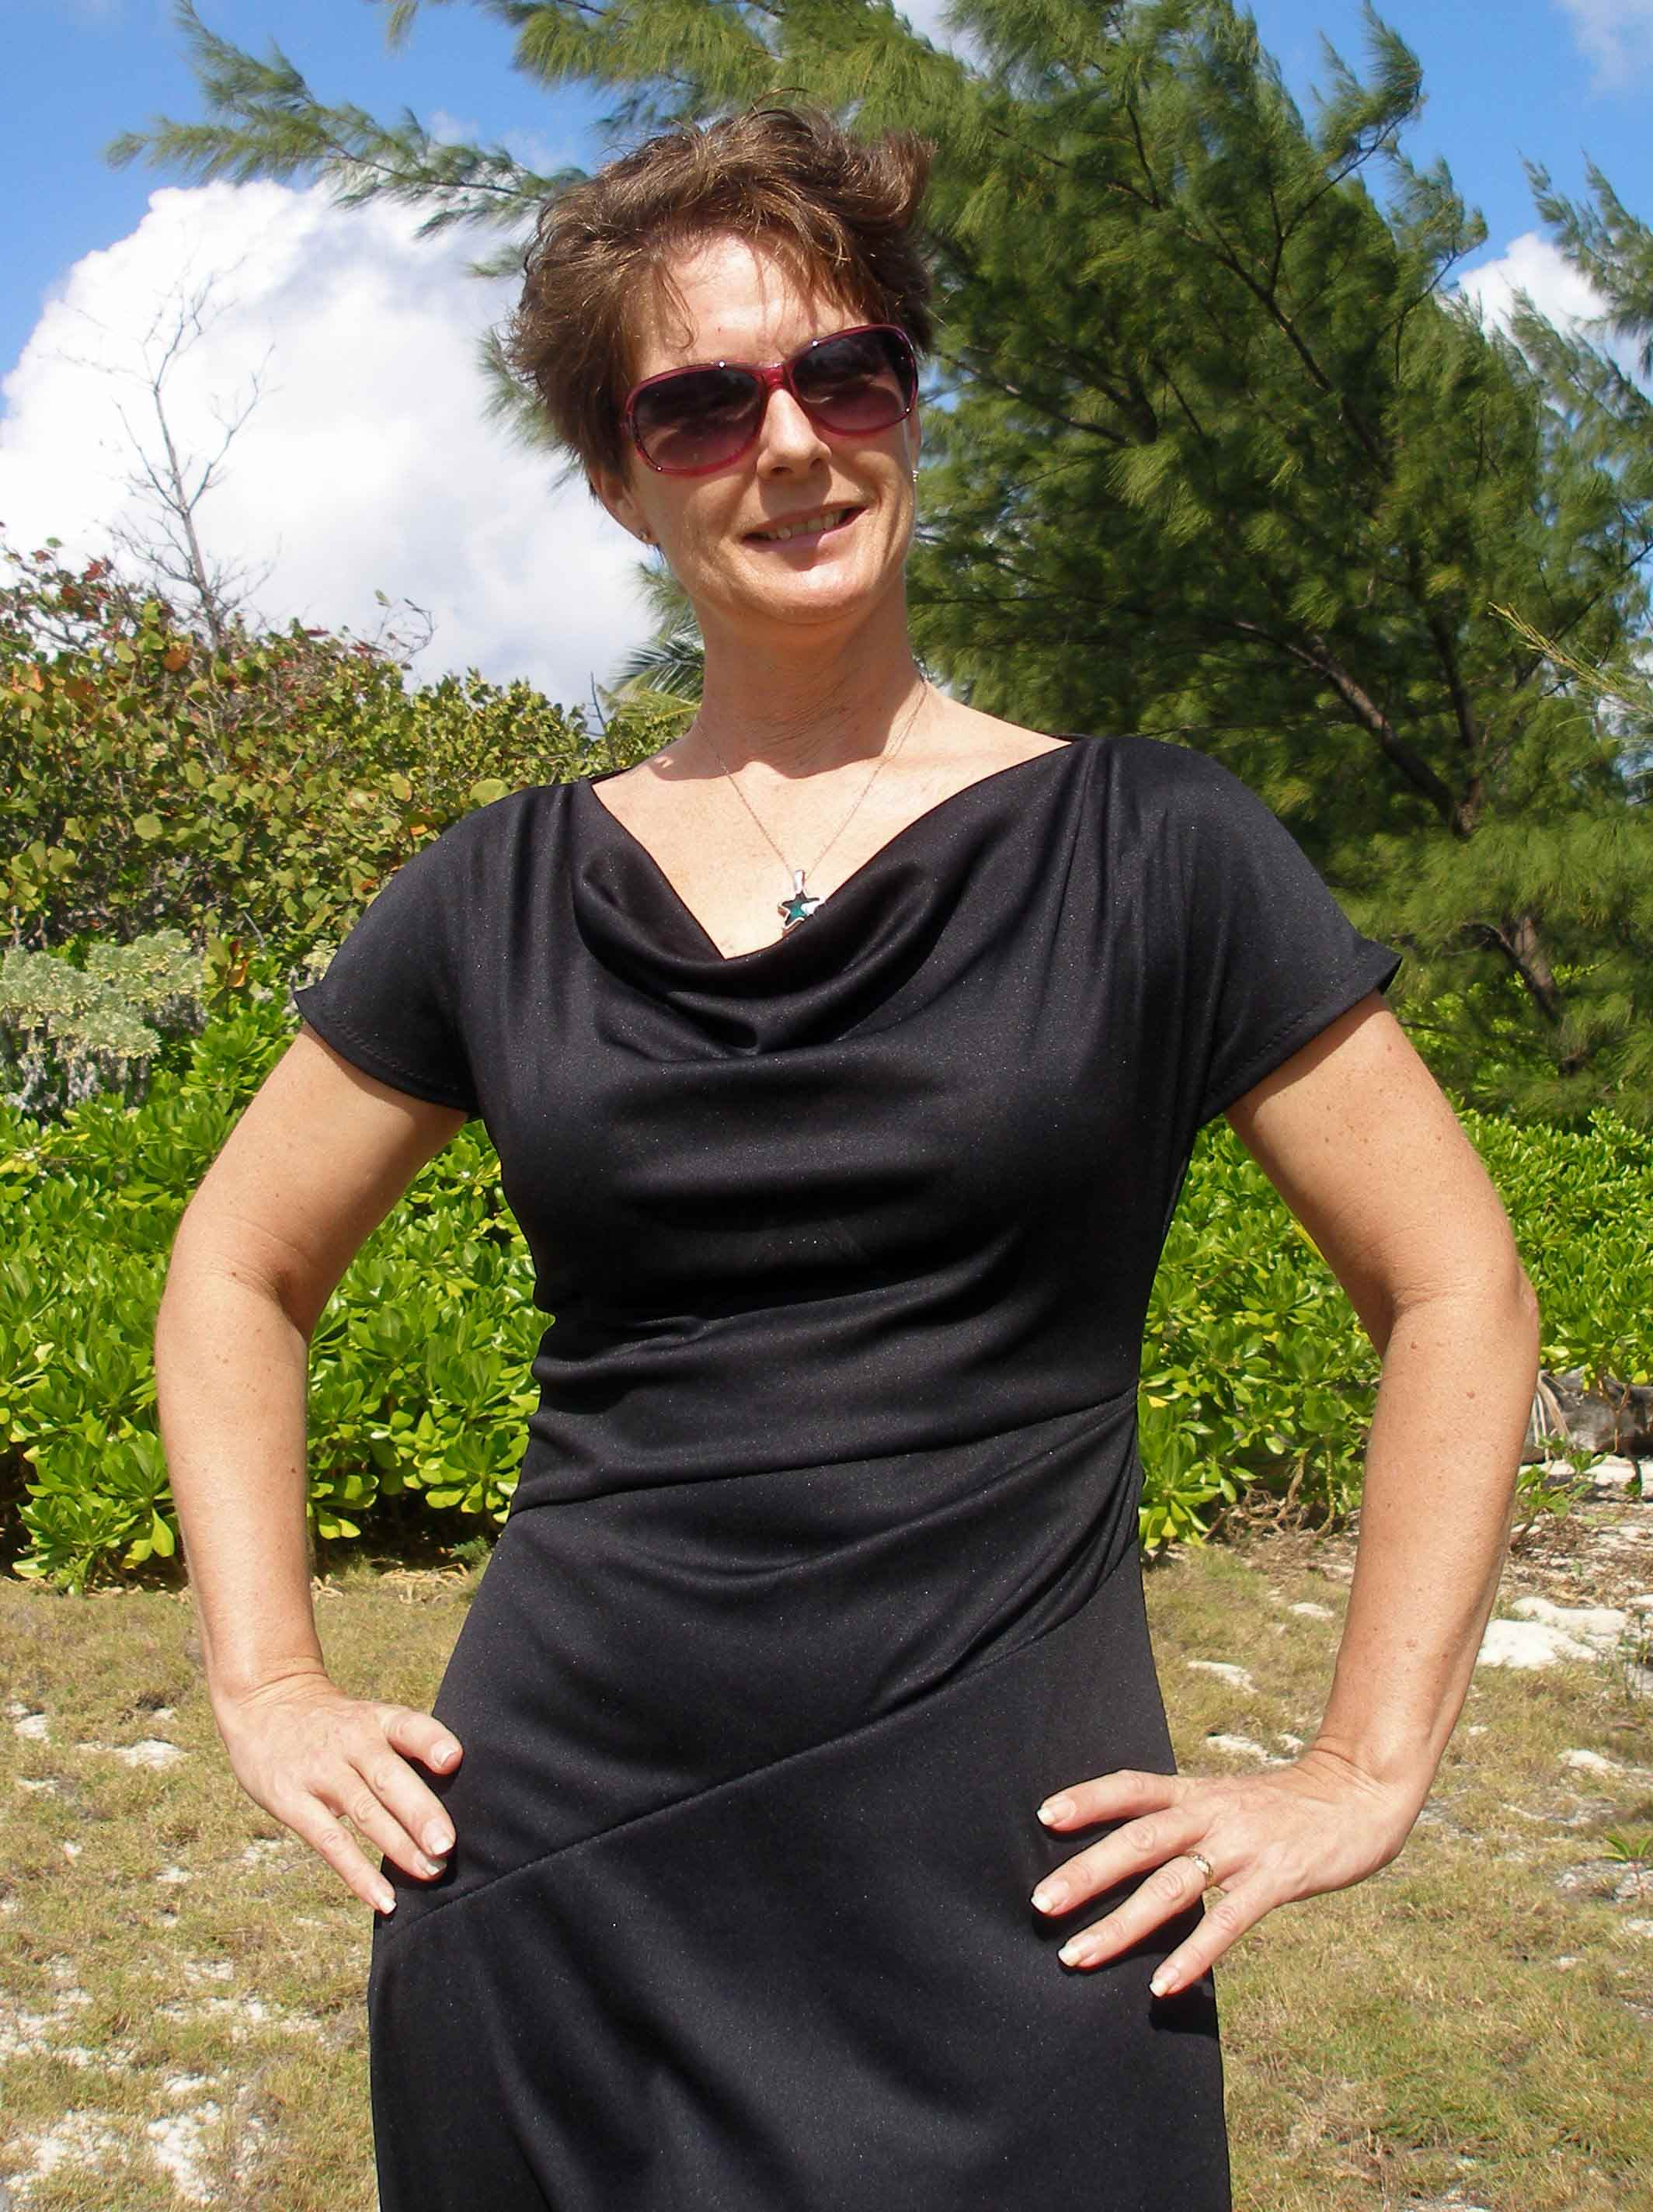 So Sew Easy - Eva knit dress